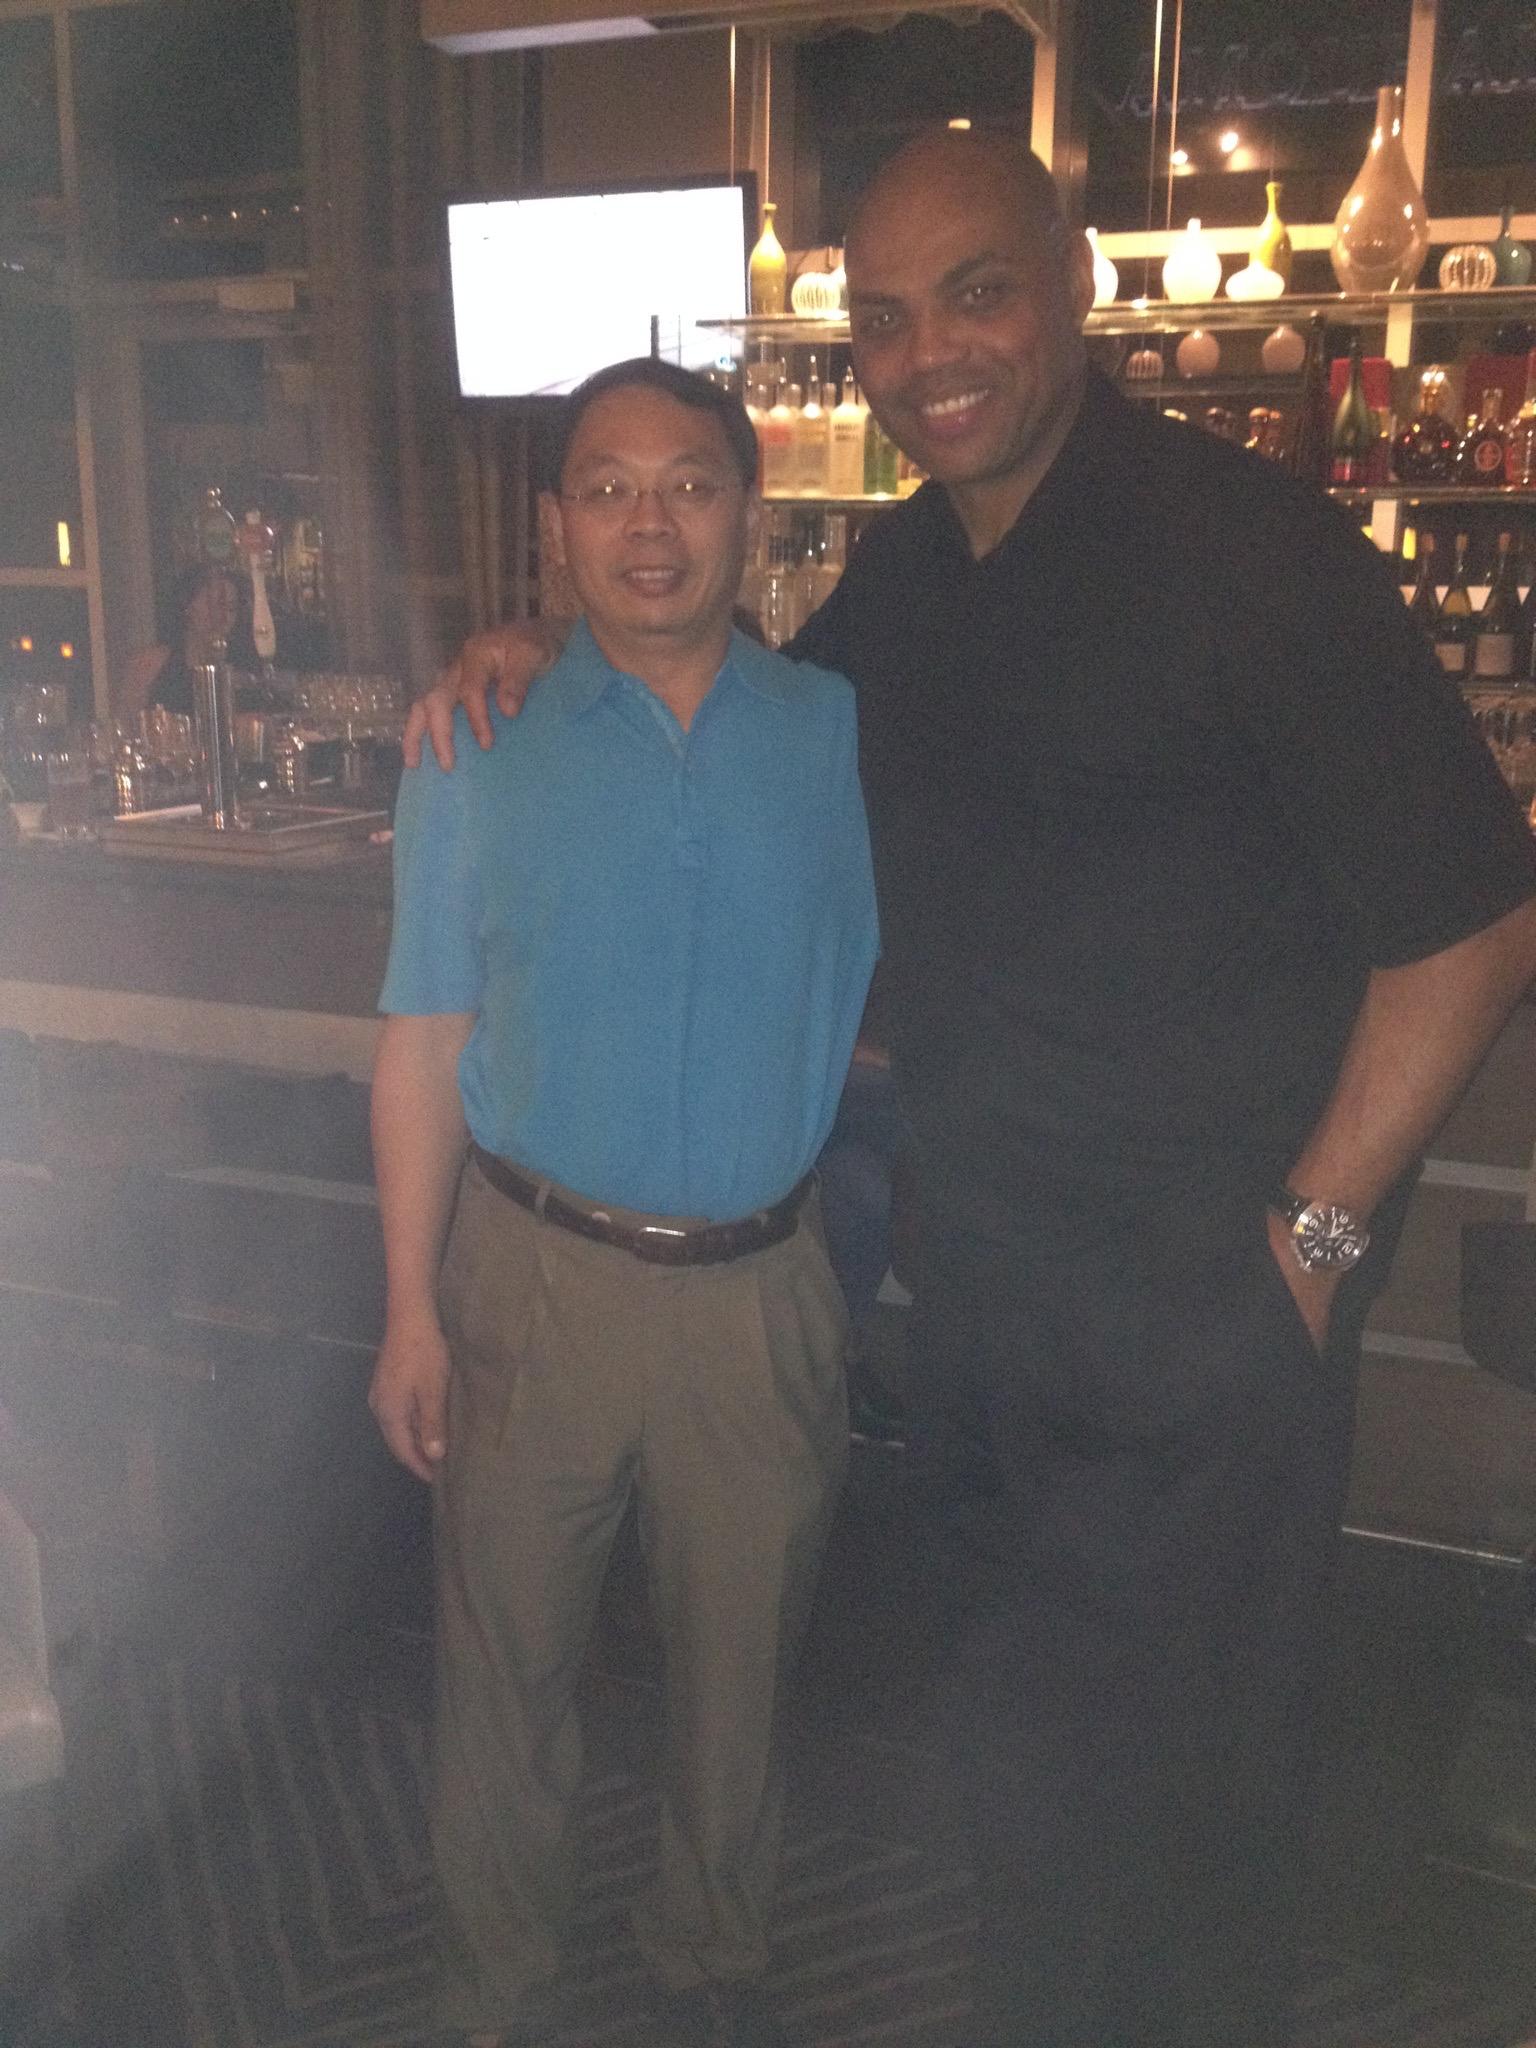 Lin Wang with his friend, NBA Hall of Famer Charles Barkley.